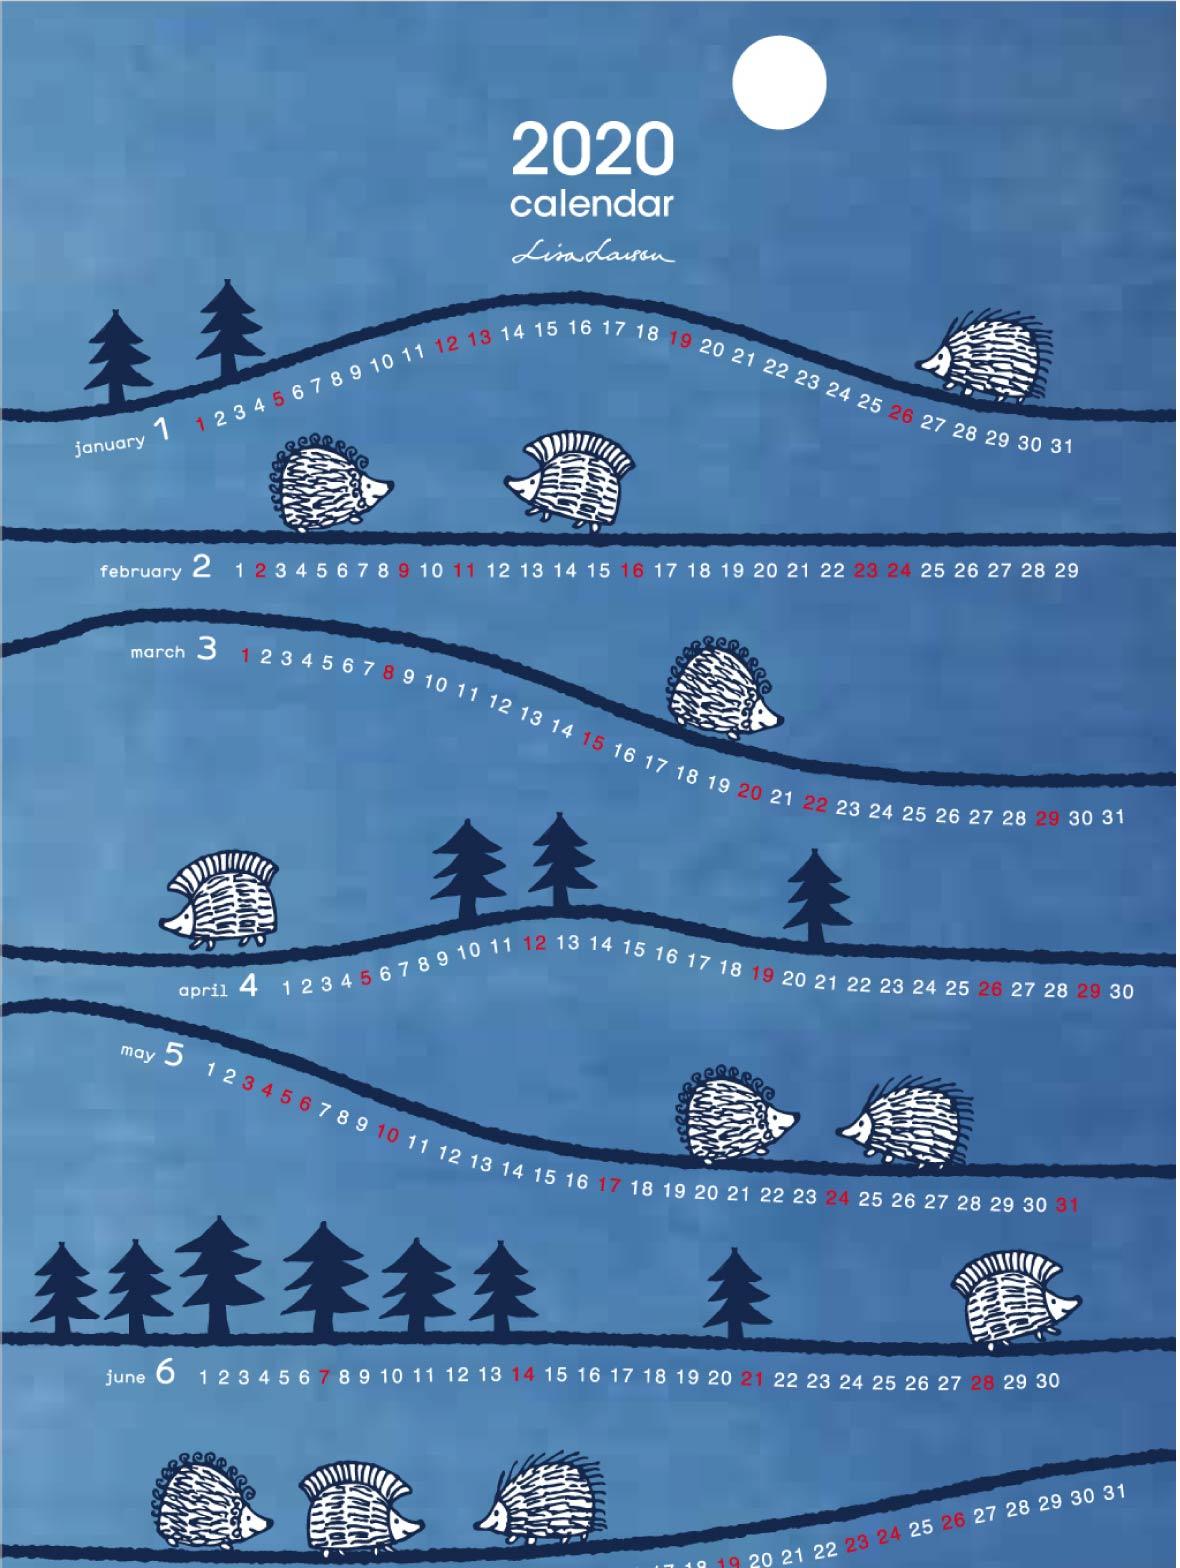 【TK】藍染てぬぐいカレンダー2020(ハリネズミ)